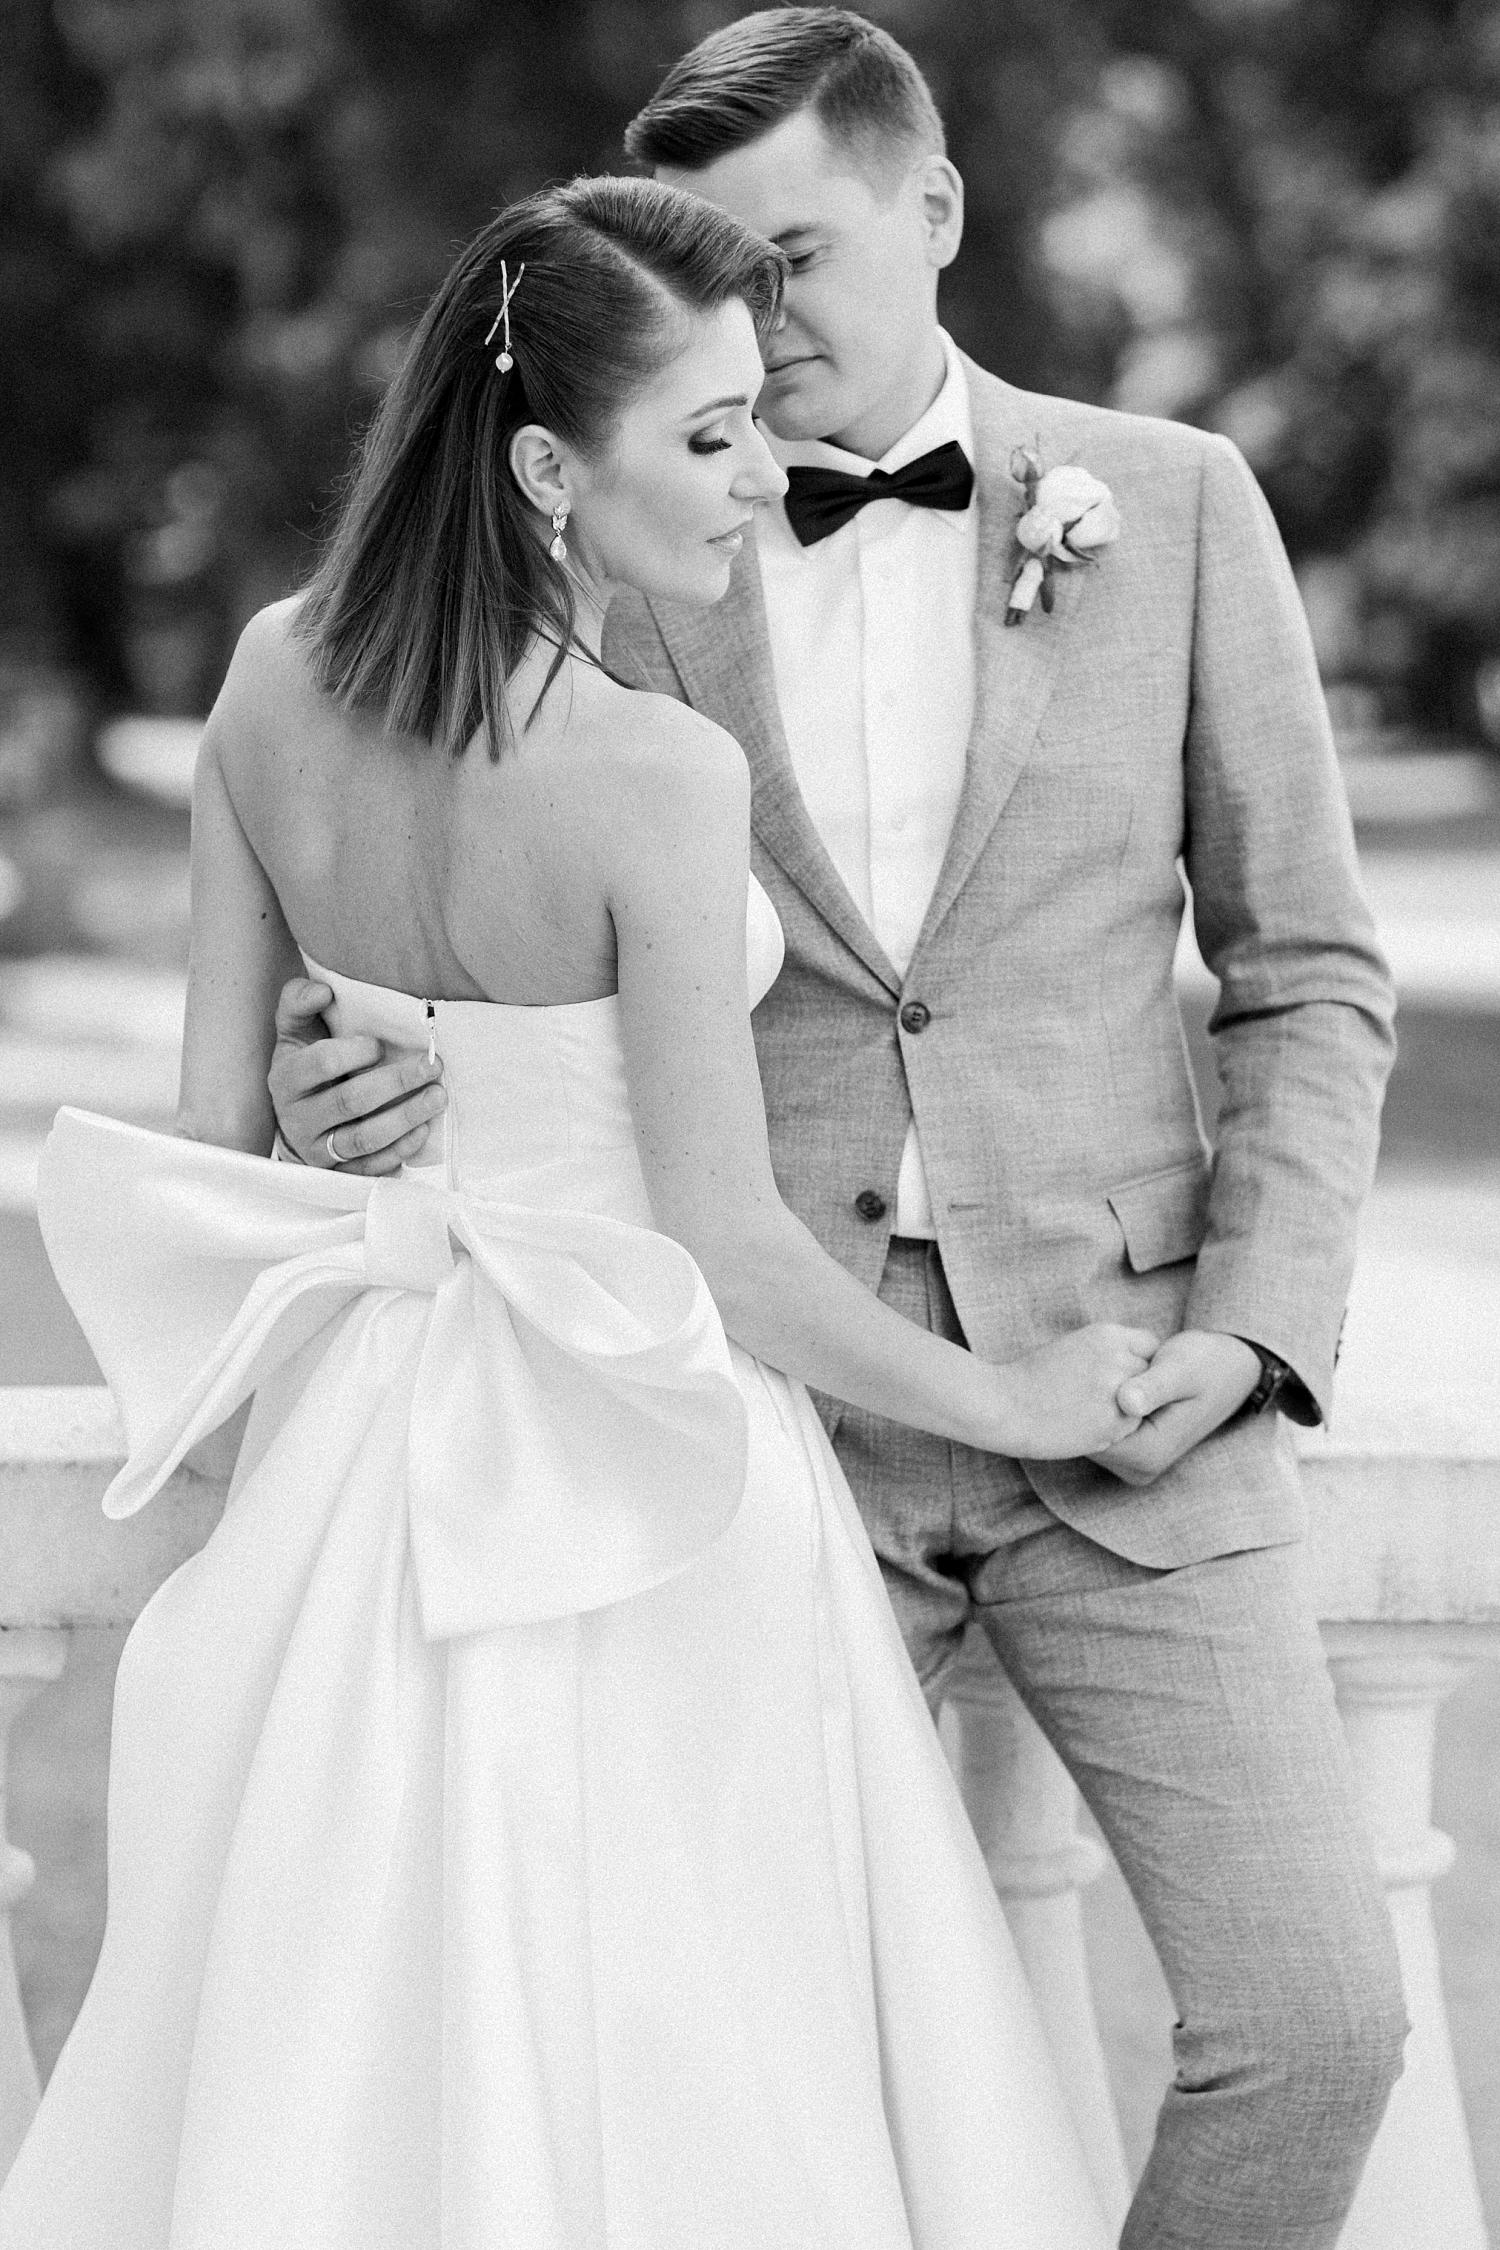 bride and groom posed romantic portrait - photo by Jurgita Lukos Photography